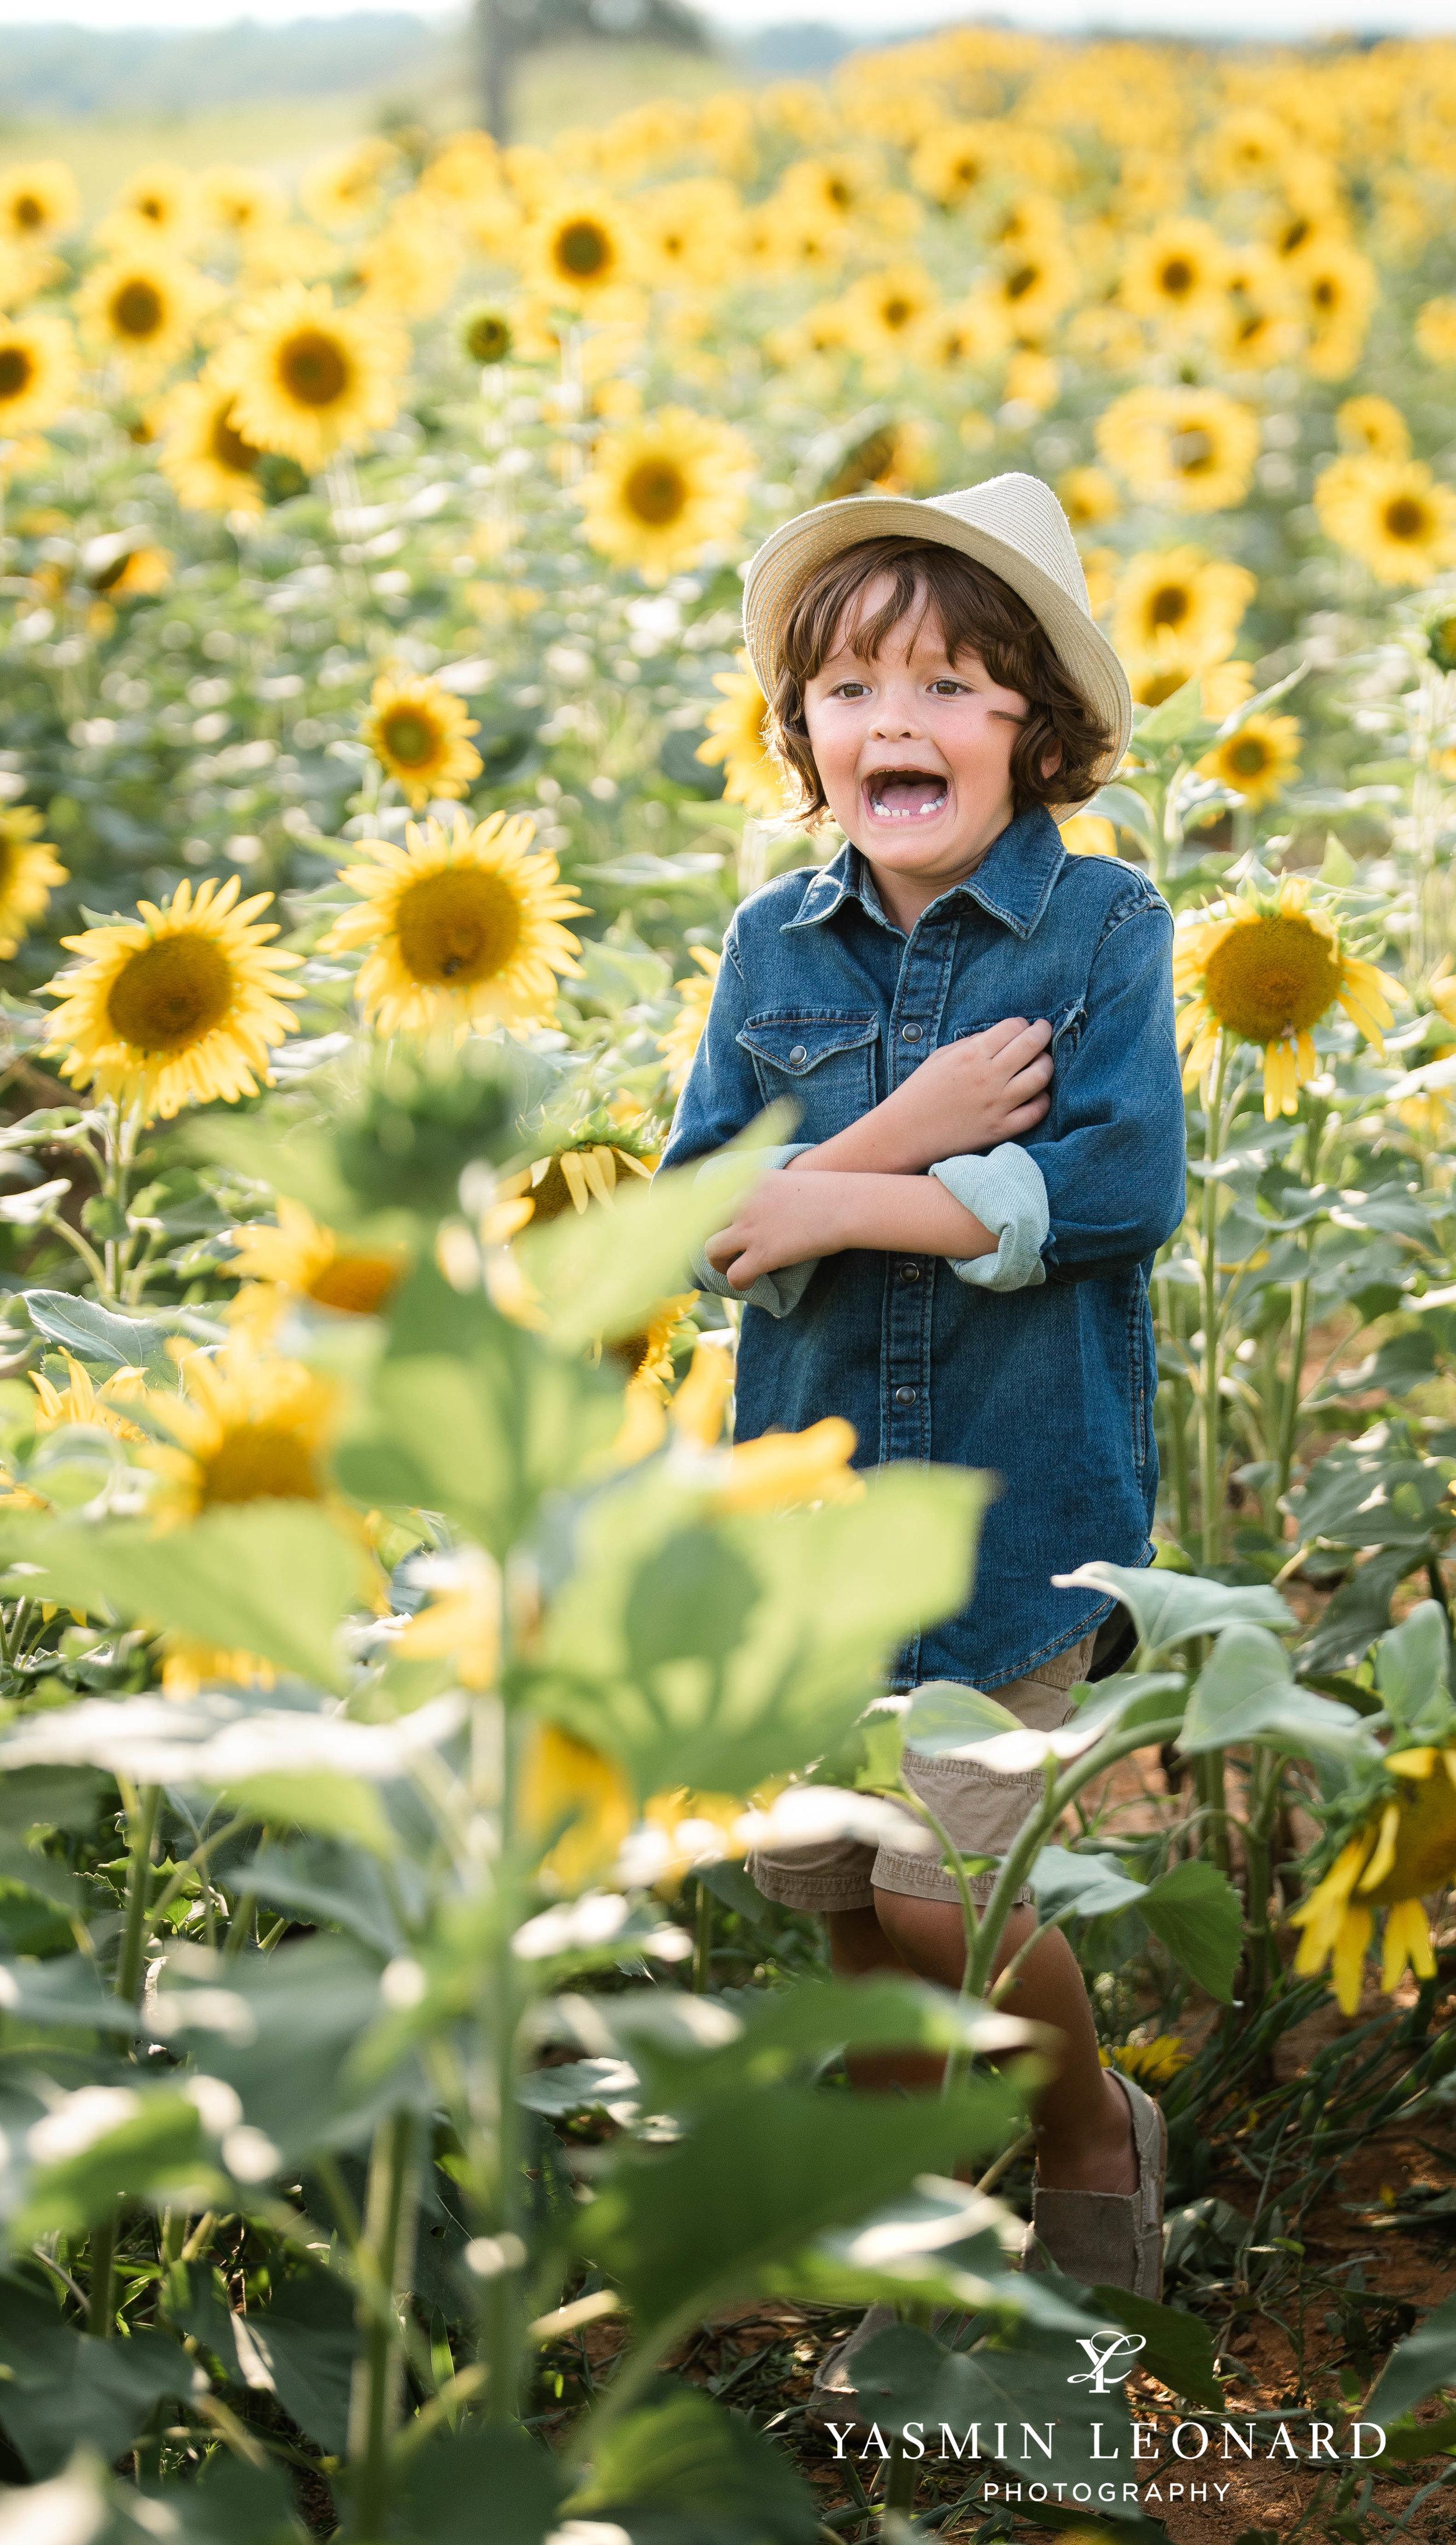 Sunflower Mini Session - Dogwood Farms - Sunflower Field - Boys in Sunflower Field - What to wear sunflower field - Yasmin Leonard Photography-2.jpg